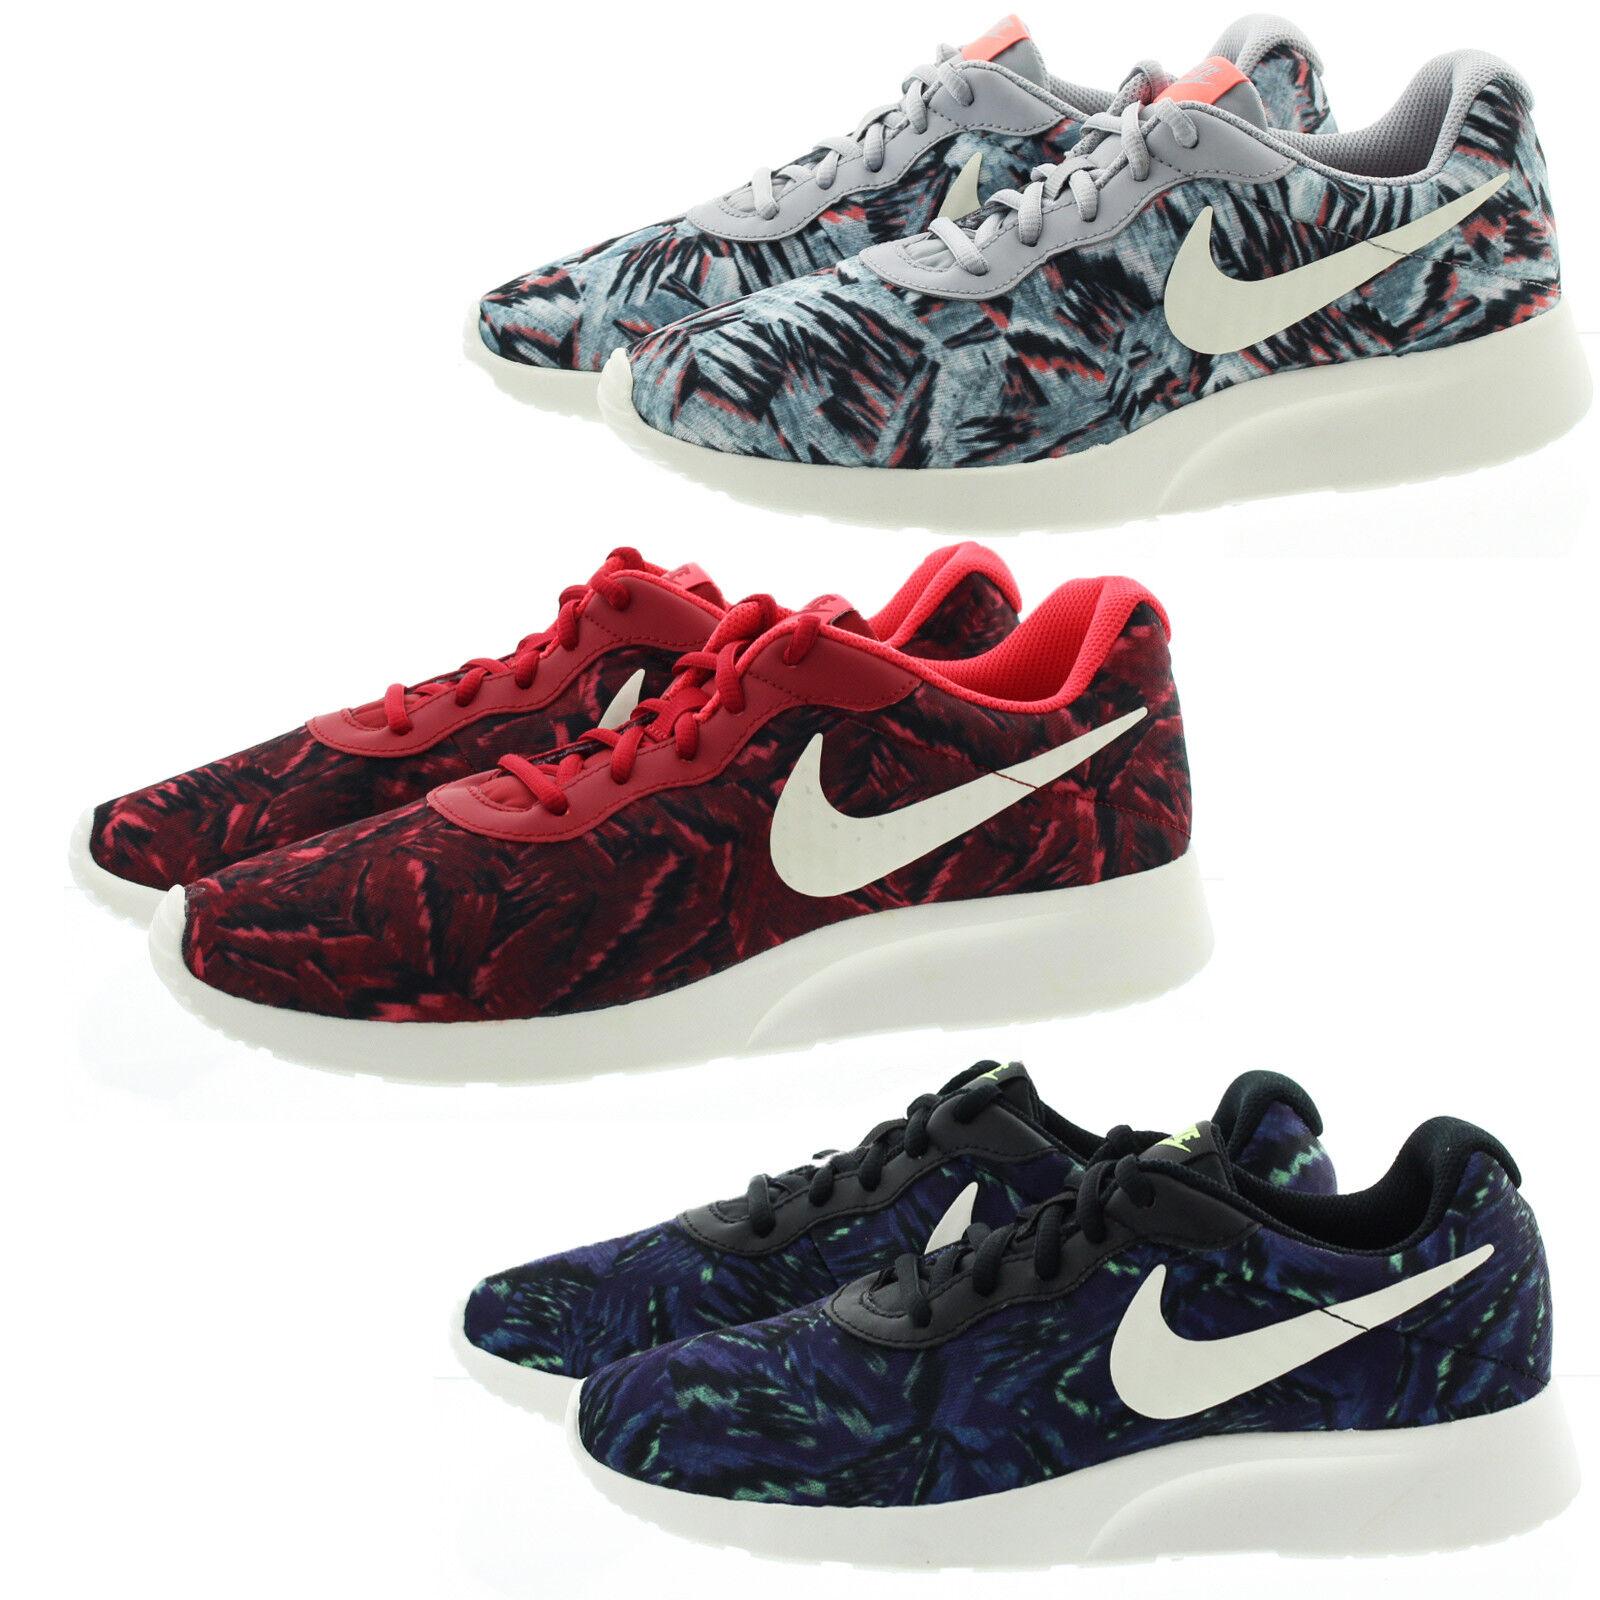 def9c277815c ... official store nike 820201 womens running tanjun print low top  lightweight running womens shoes sneakers c64a2d